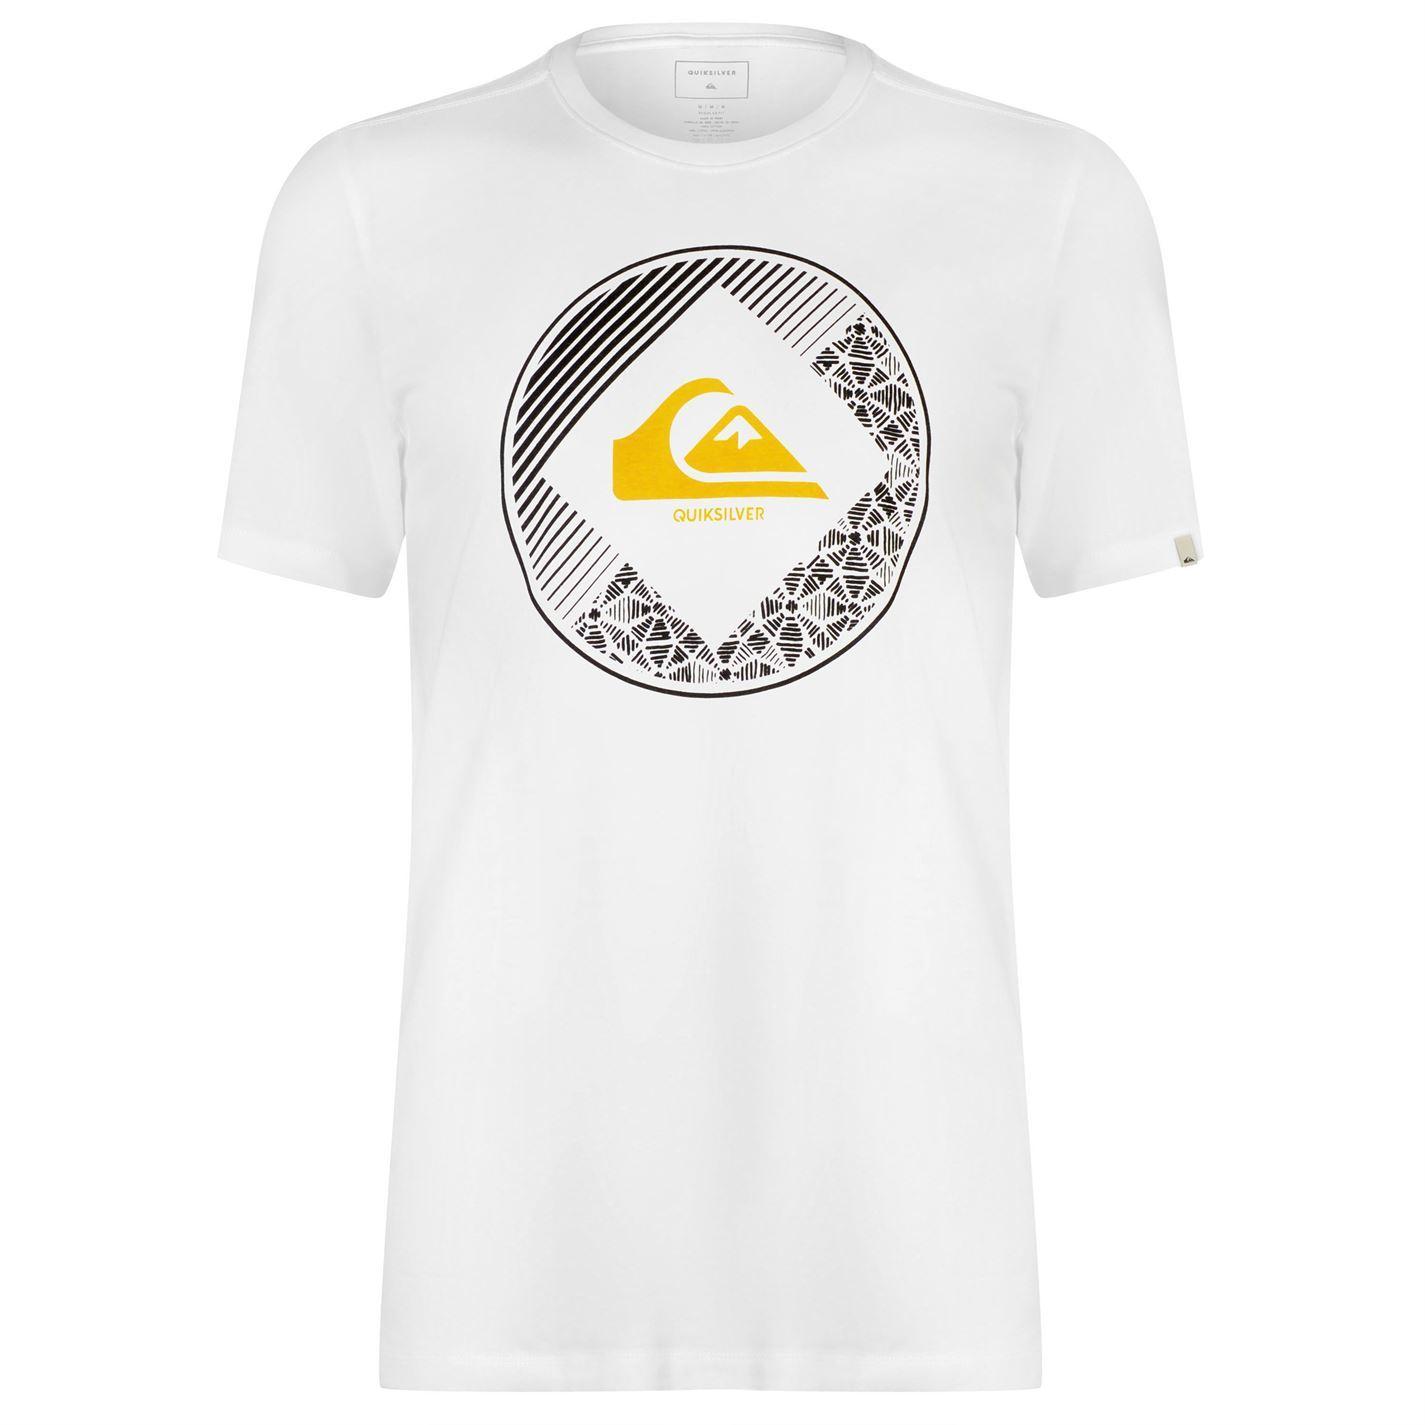 Quiksilver-Diamond-Logo-T-Shirt-Mens-Top-Tee-Shirt-White-Small thumbnail 8